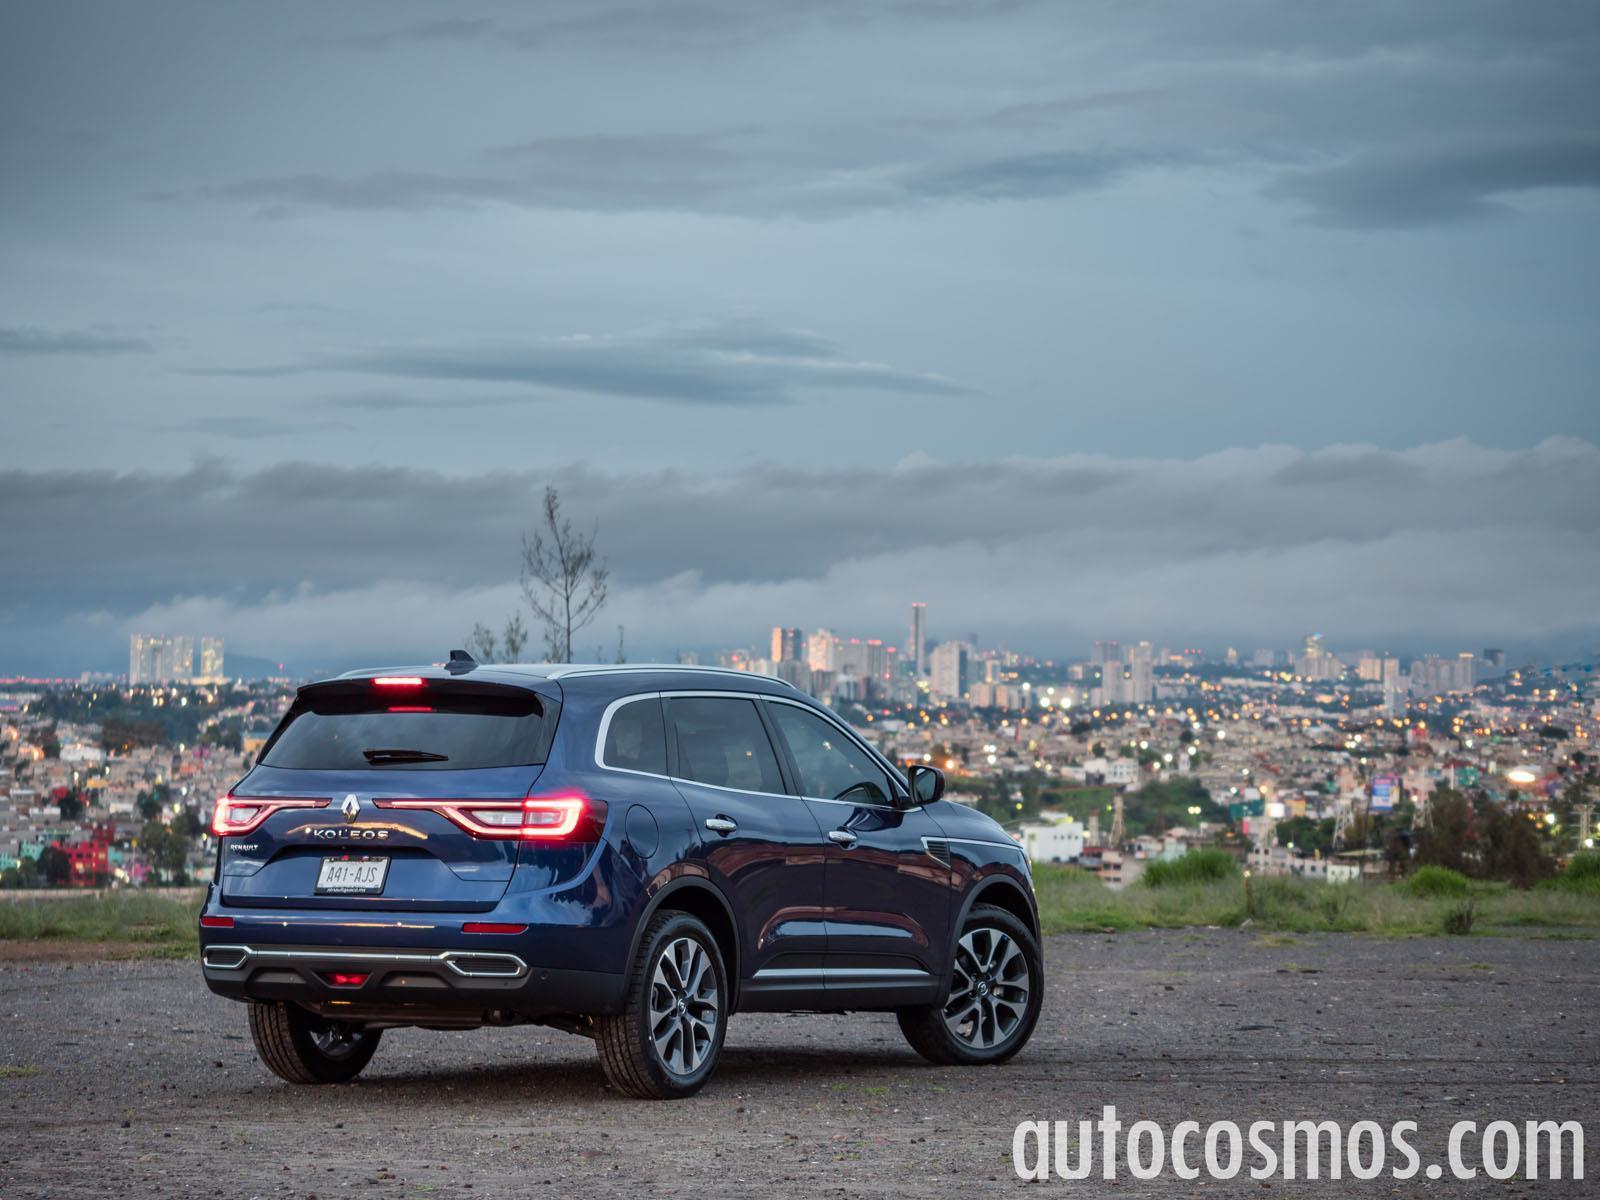 Renault Koleos 2017 llega a México desde $355,000 pesos